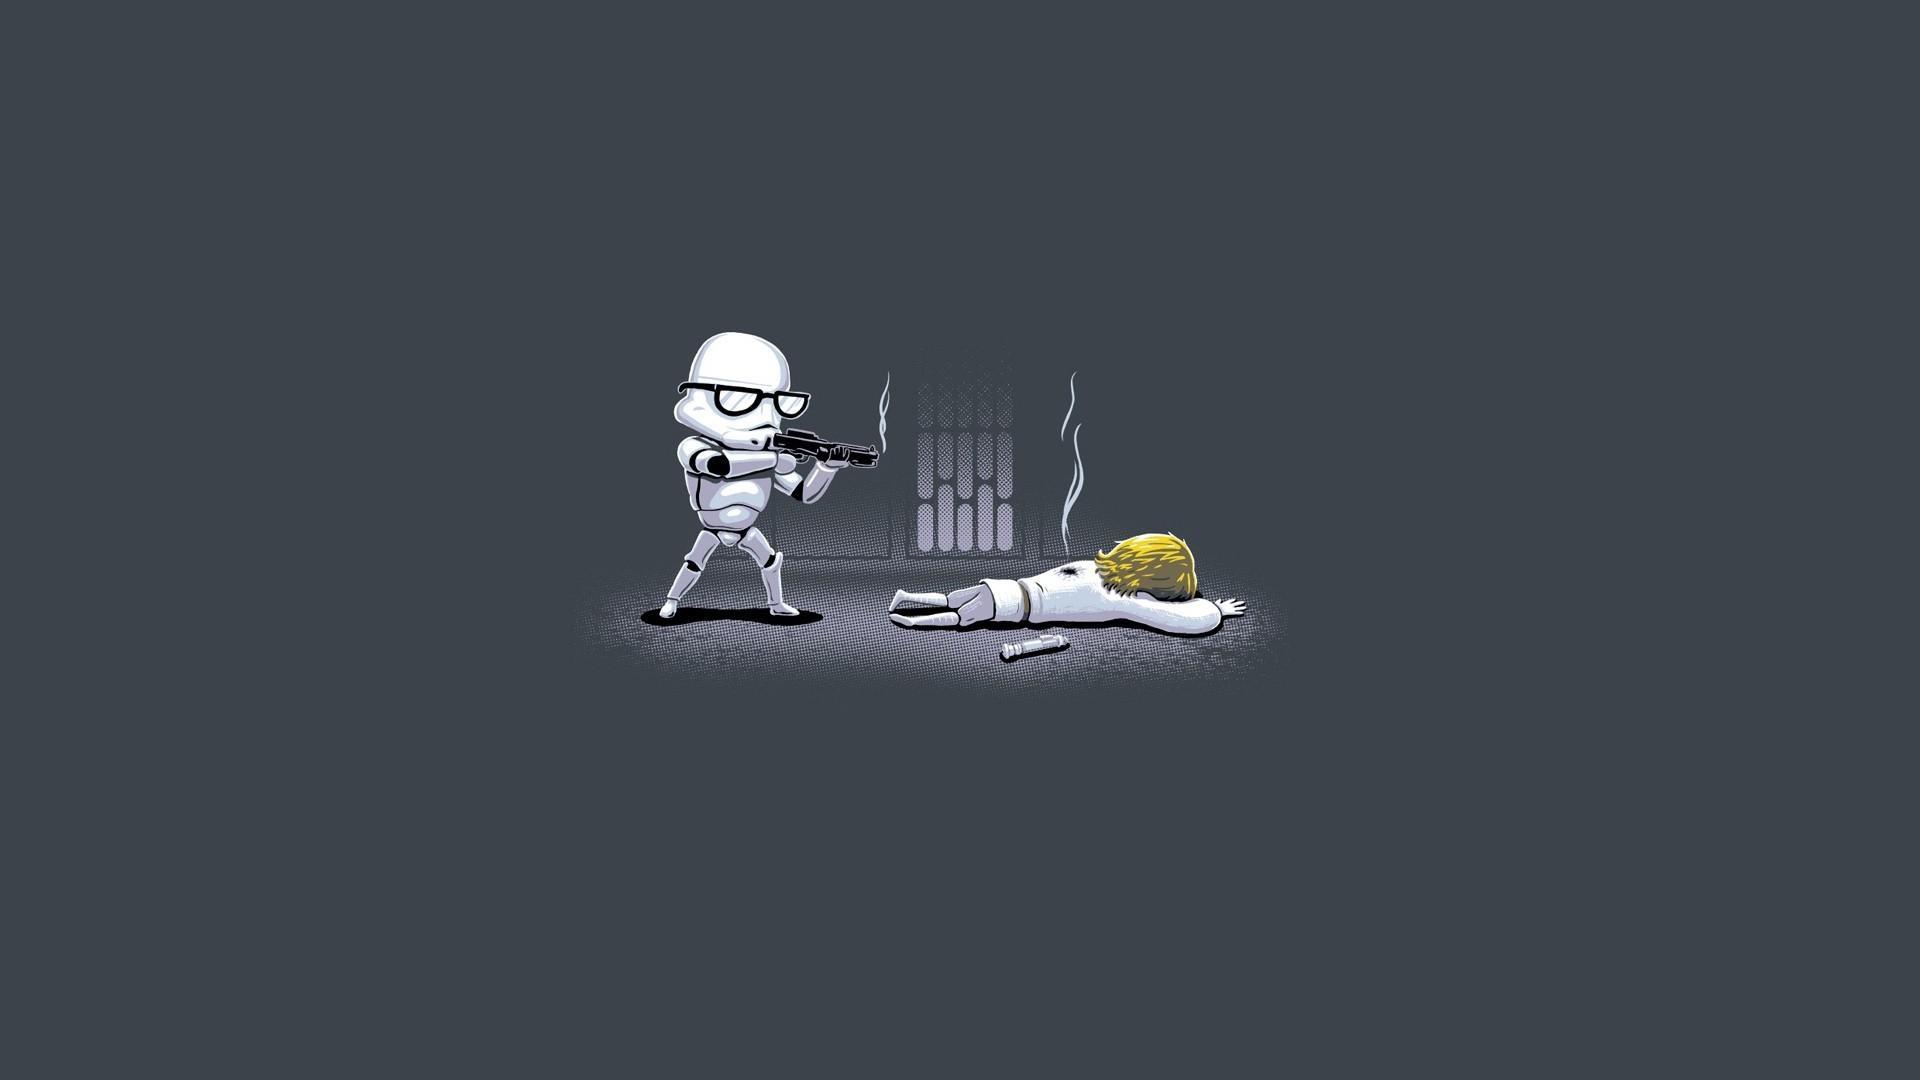 Star Wars Minimalistic Guns Stormtroopers Lightsabers Glasses Luke  Skywalker Ownage Pictures Free